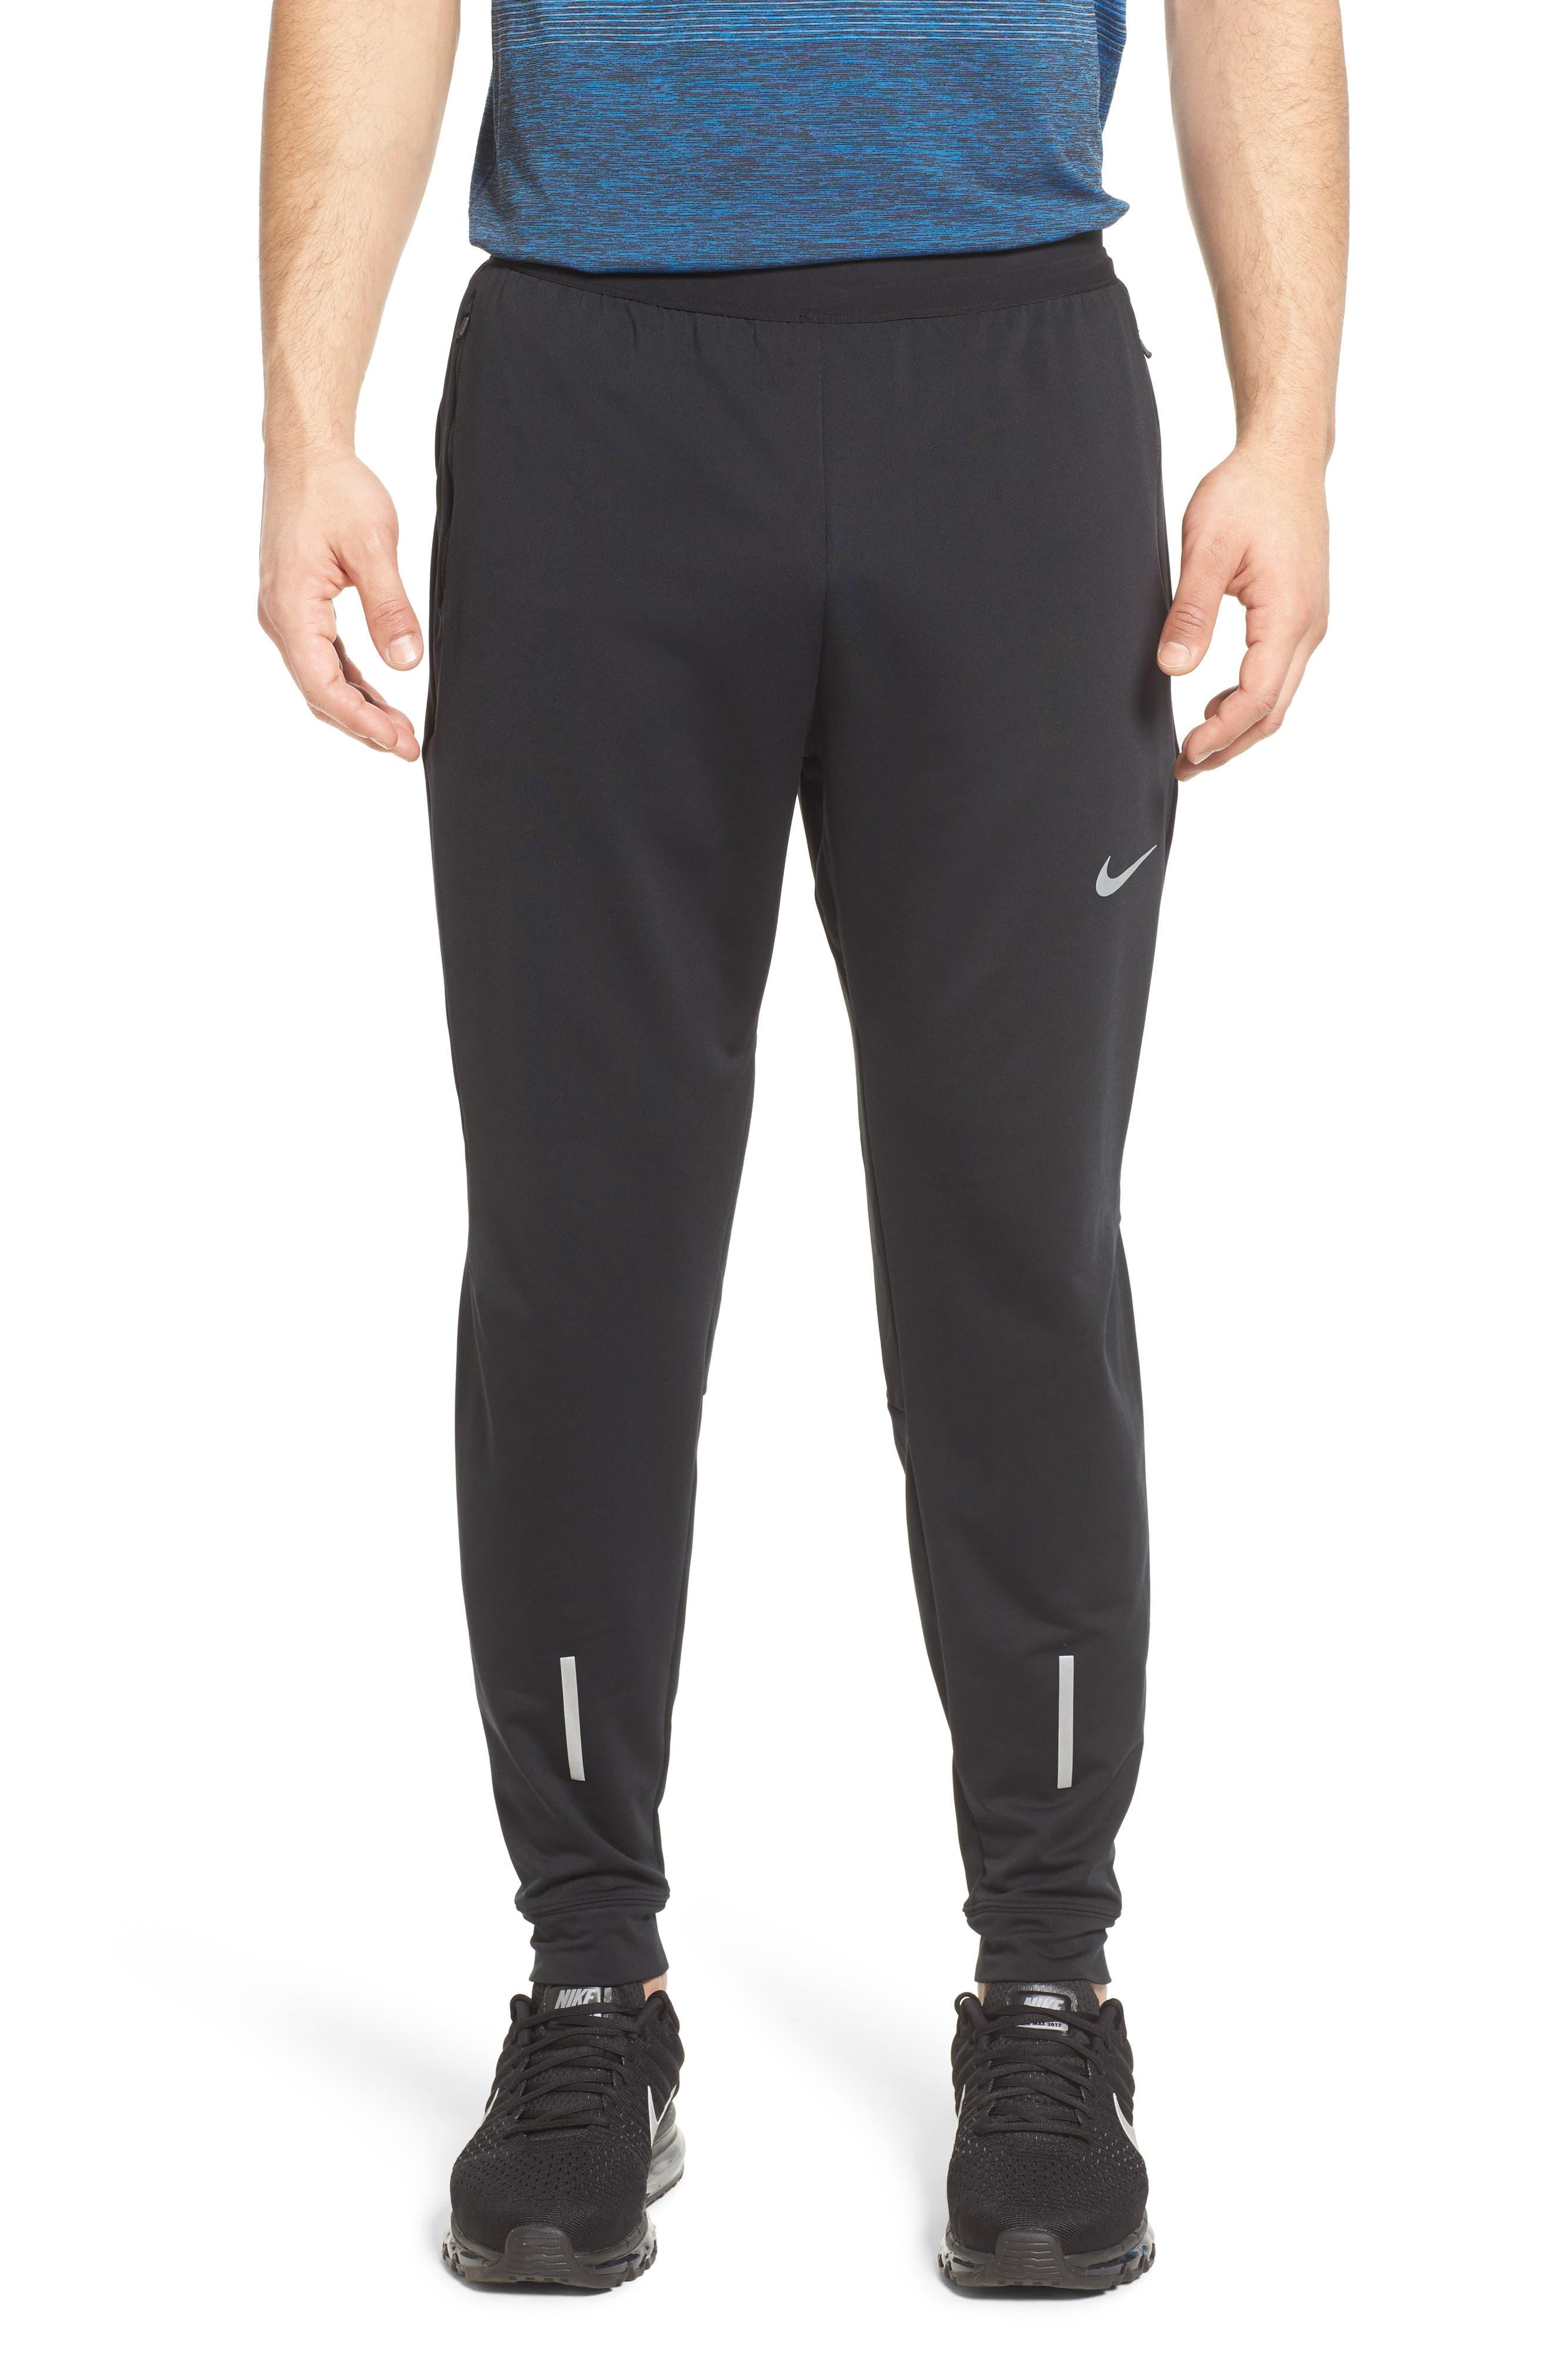 Dry Running Pants,                         Main,                         color, BLACK